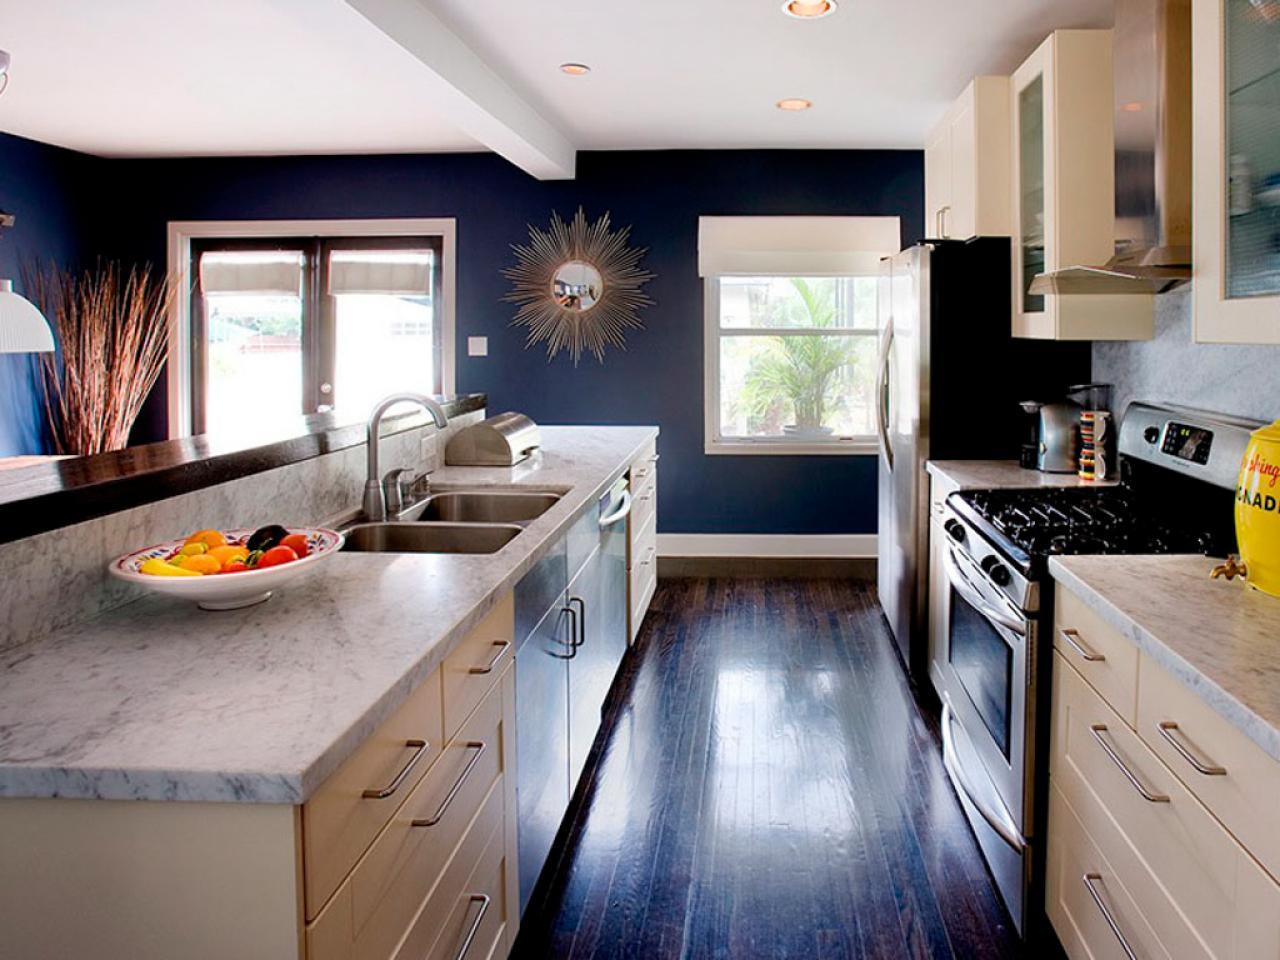 Ideas for Updating Kitchen Countertops s4x3.jpg.rend .hgtvcom.1280.960